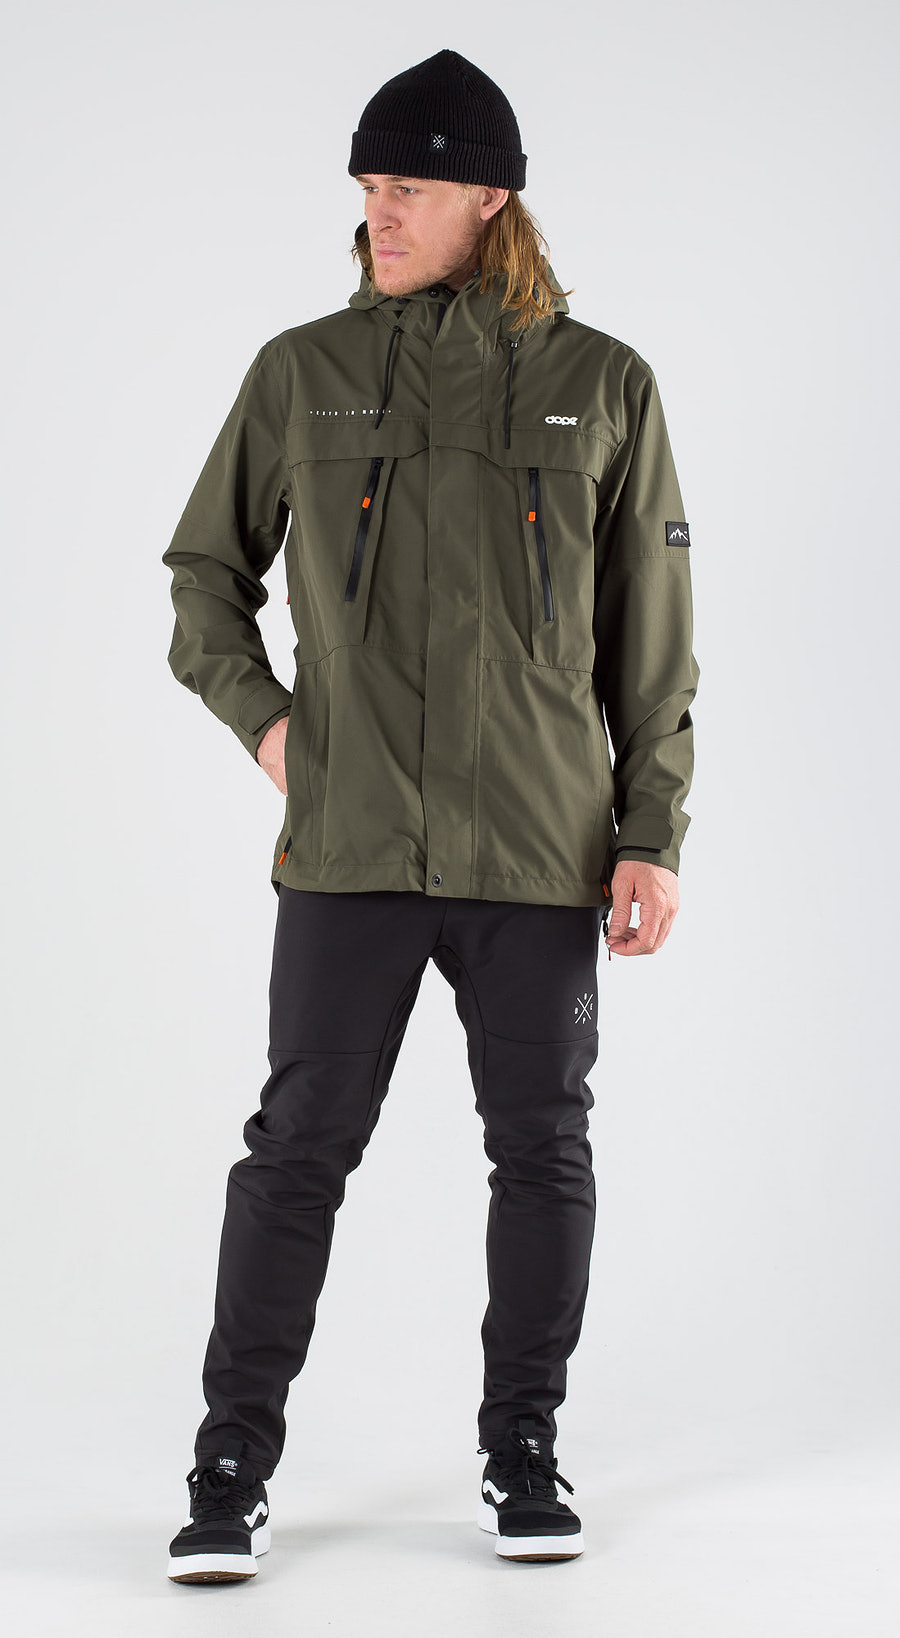 Dope Trekker Green Outfit Multi